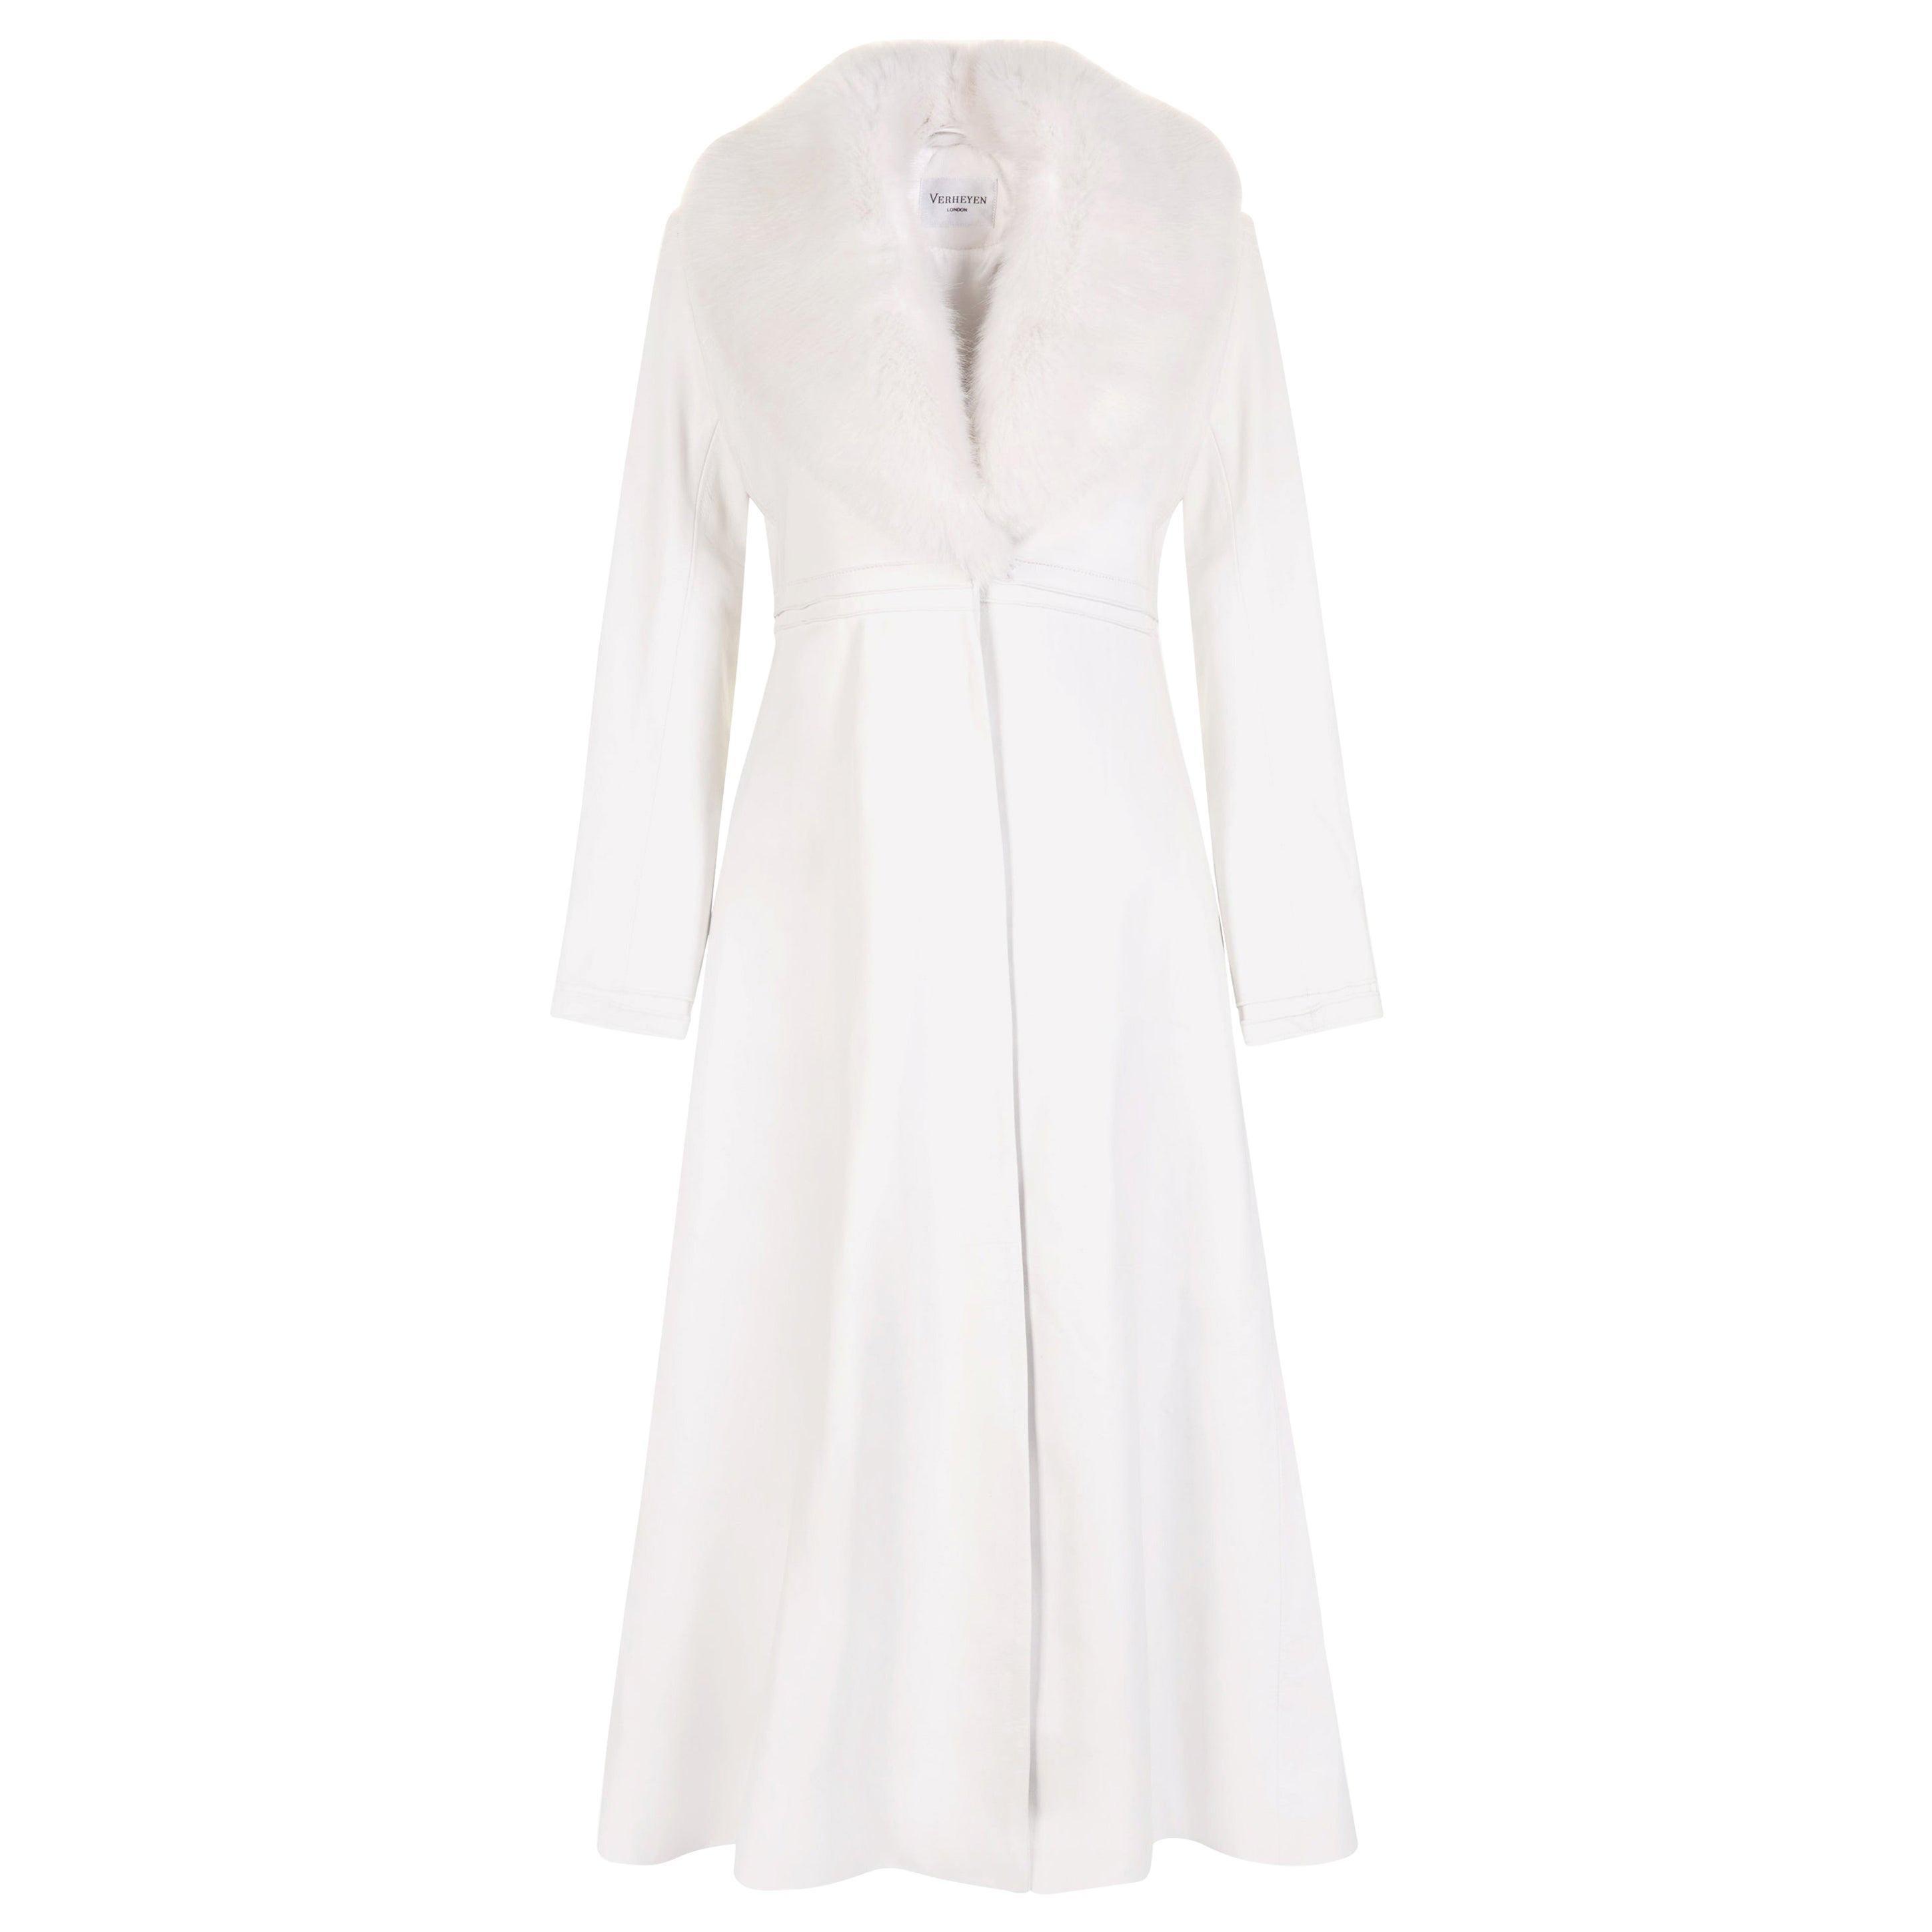 Verheyen London Edward Leather Coat in White with Faux Fur - Size uk 12